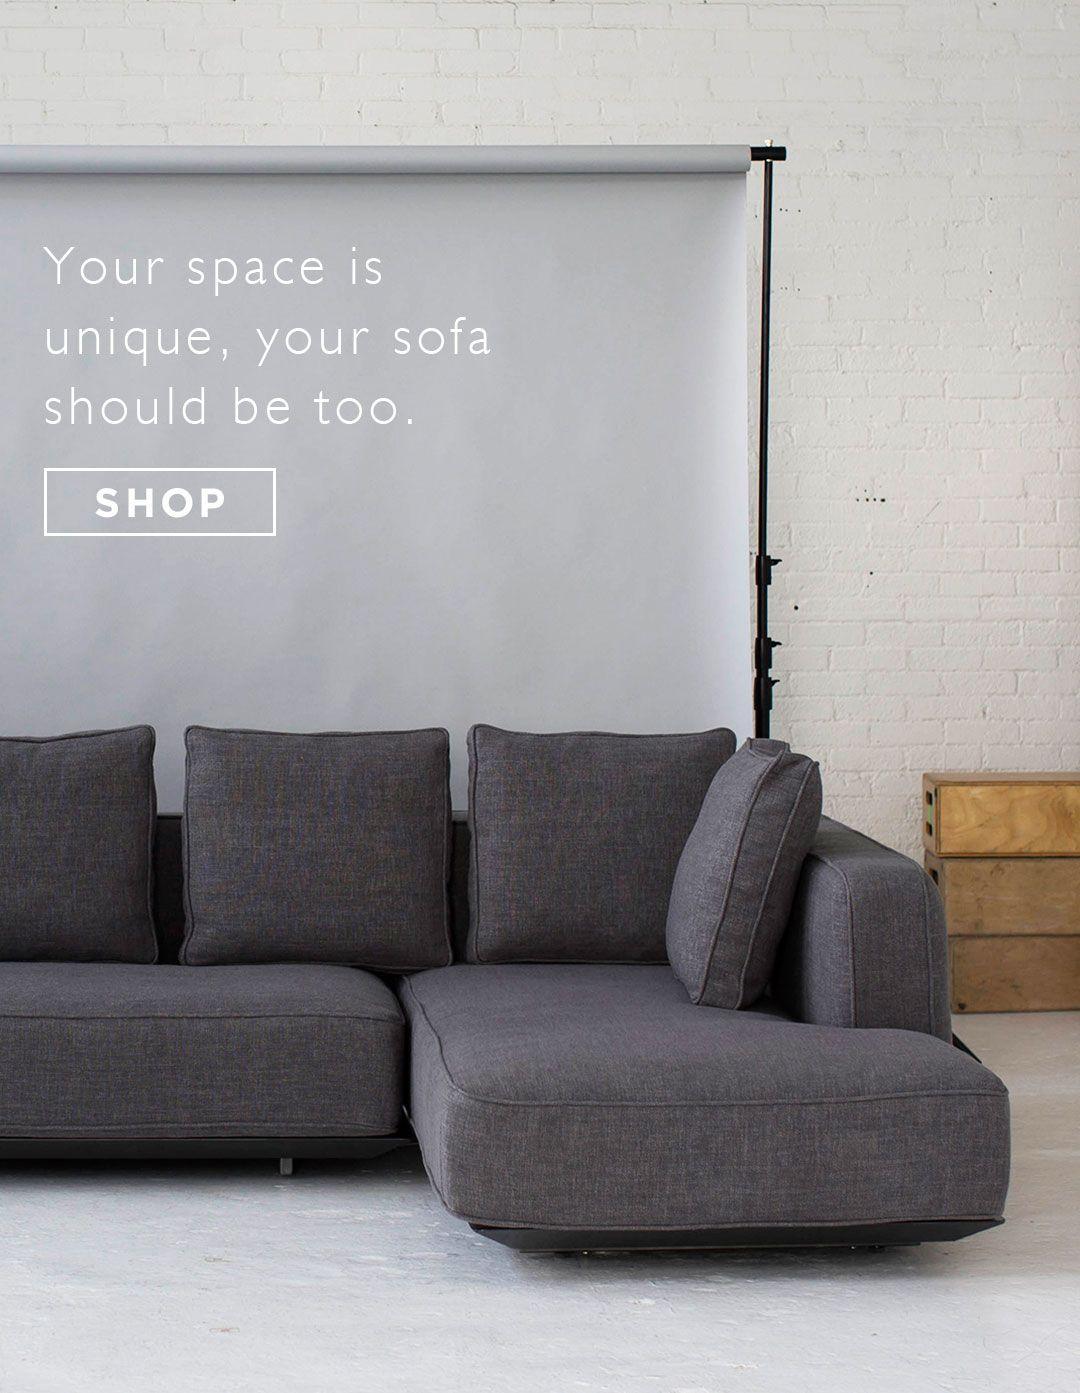 Custom Sofas At Attainable Prices Interior Define Home - Media room sofa